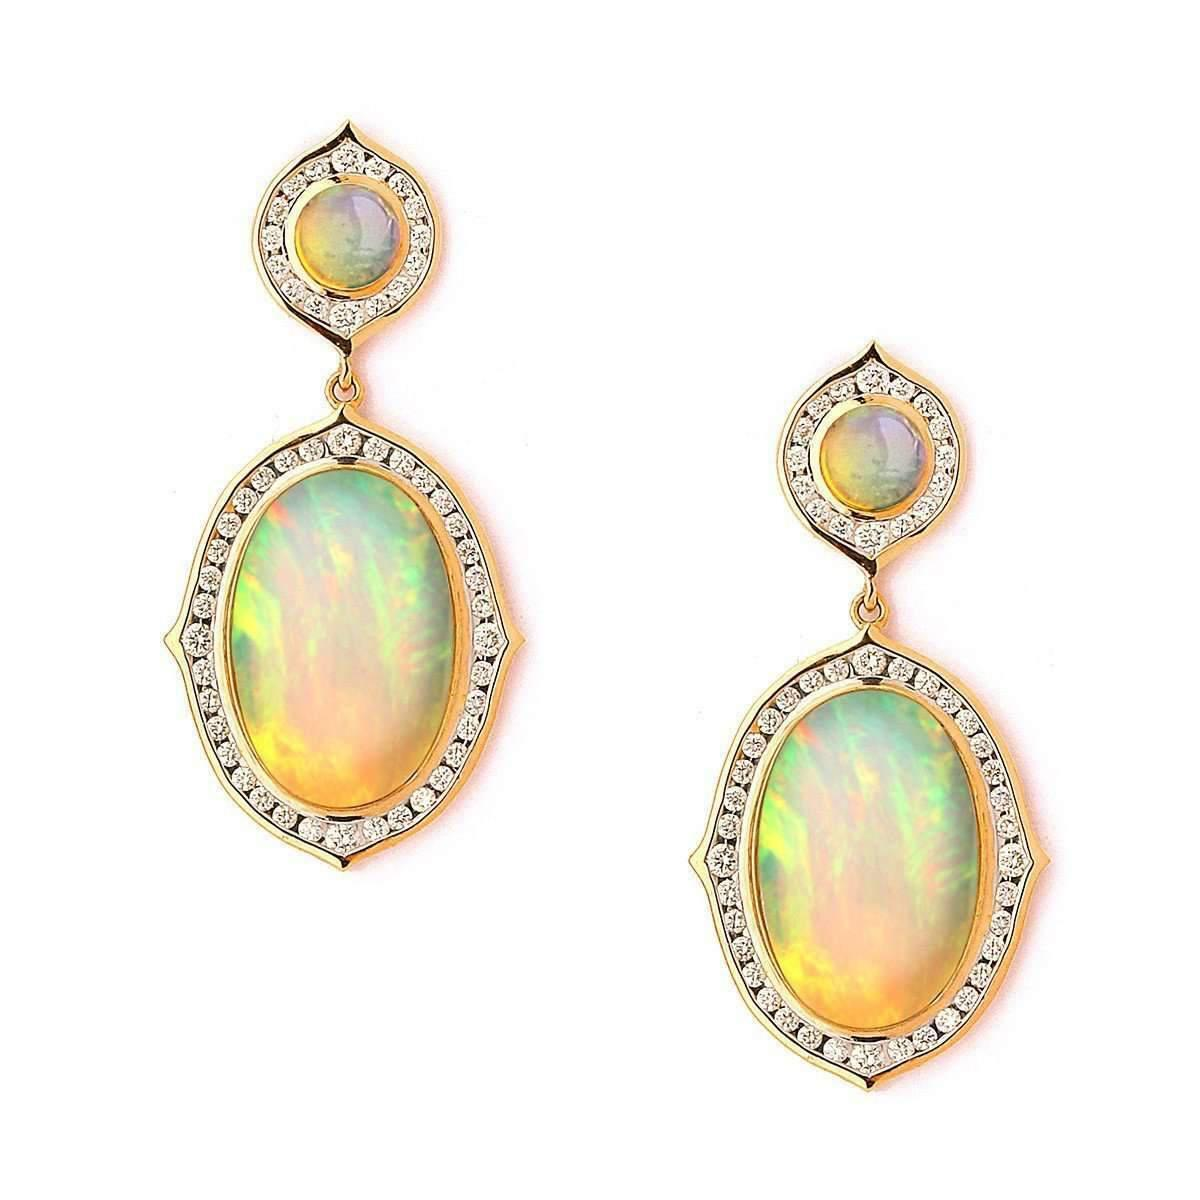 Syna 18kt Ethiopian Opal Earrings With Diamonds zeJAcMySnF